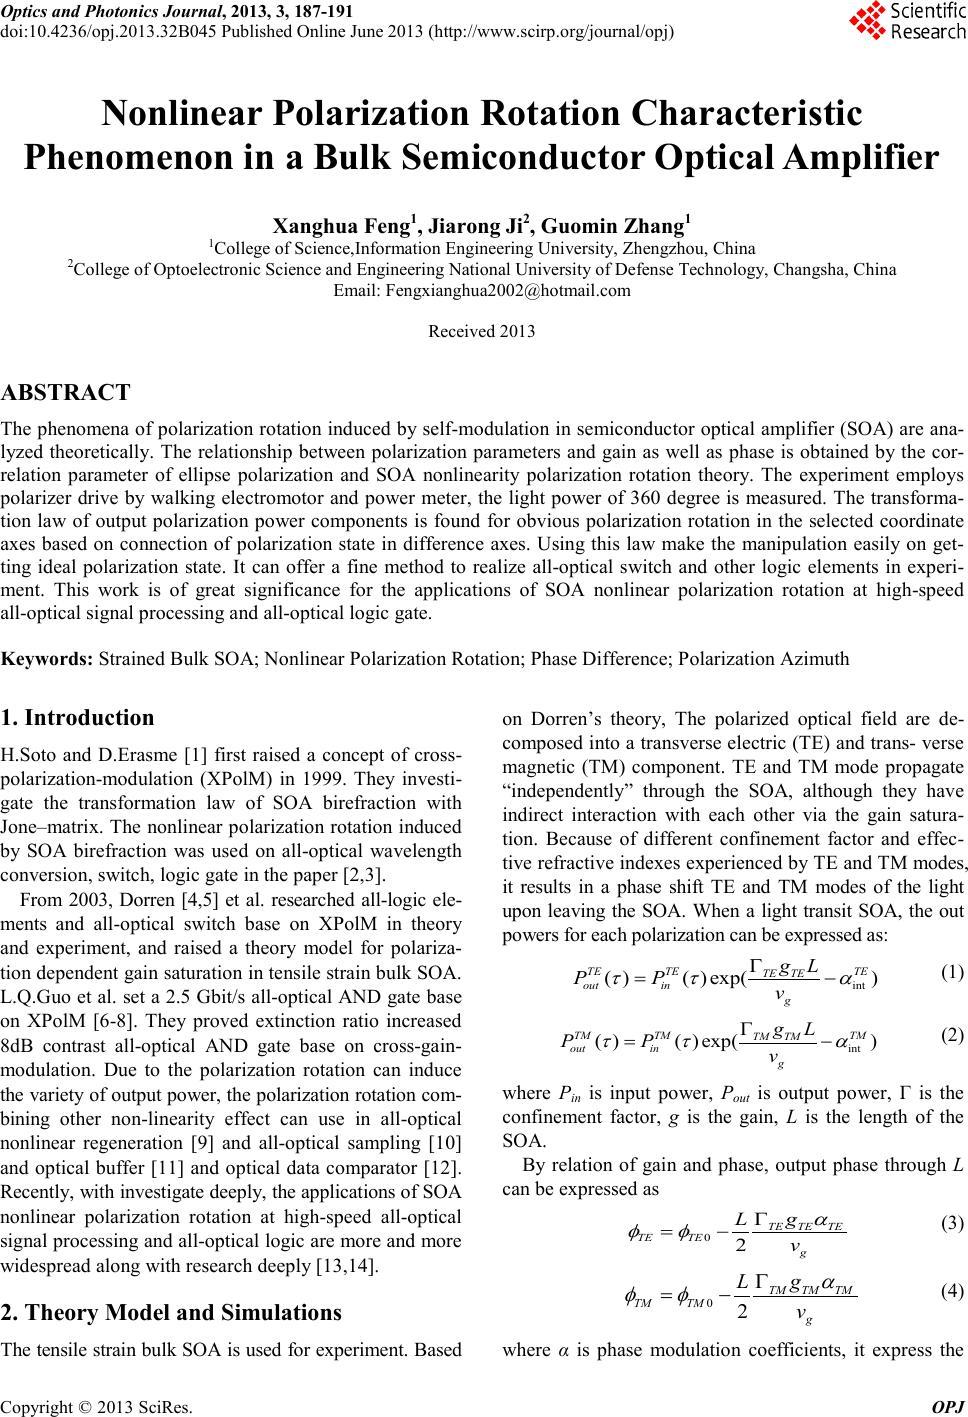 Nonlinear Polarization Rotation Characteristic Phenomenon in a Bulk